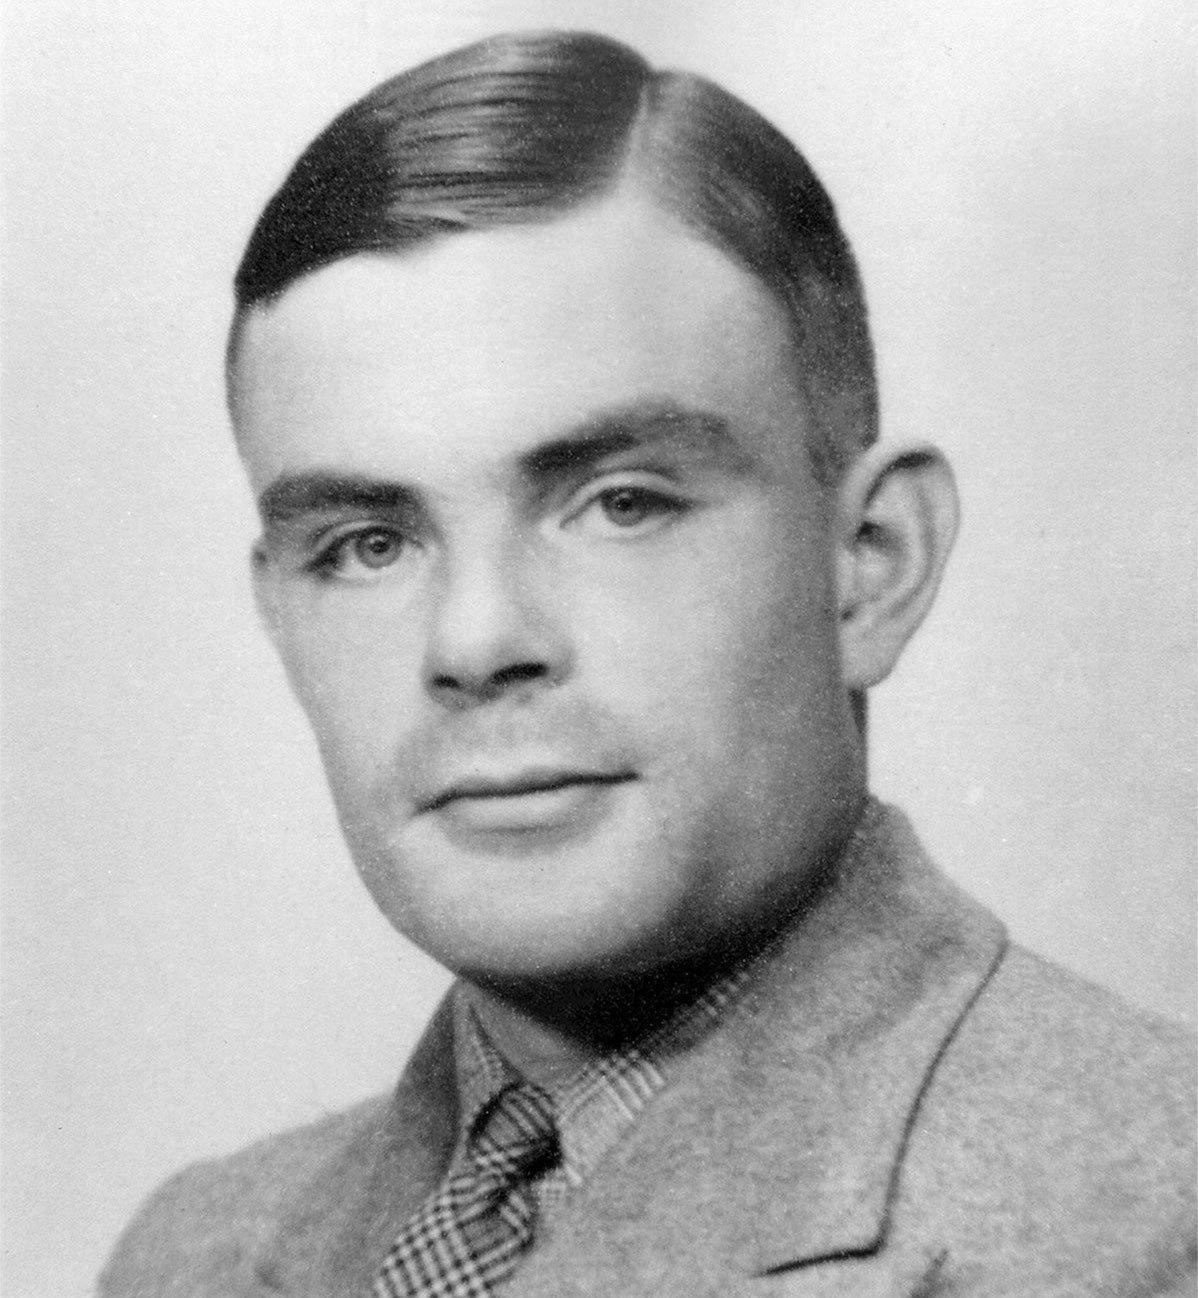 Alan-Turing_Fine Art Images-1